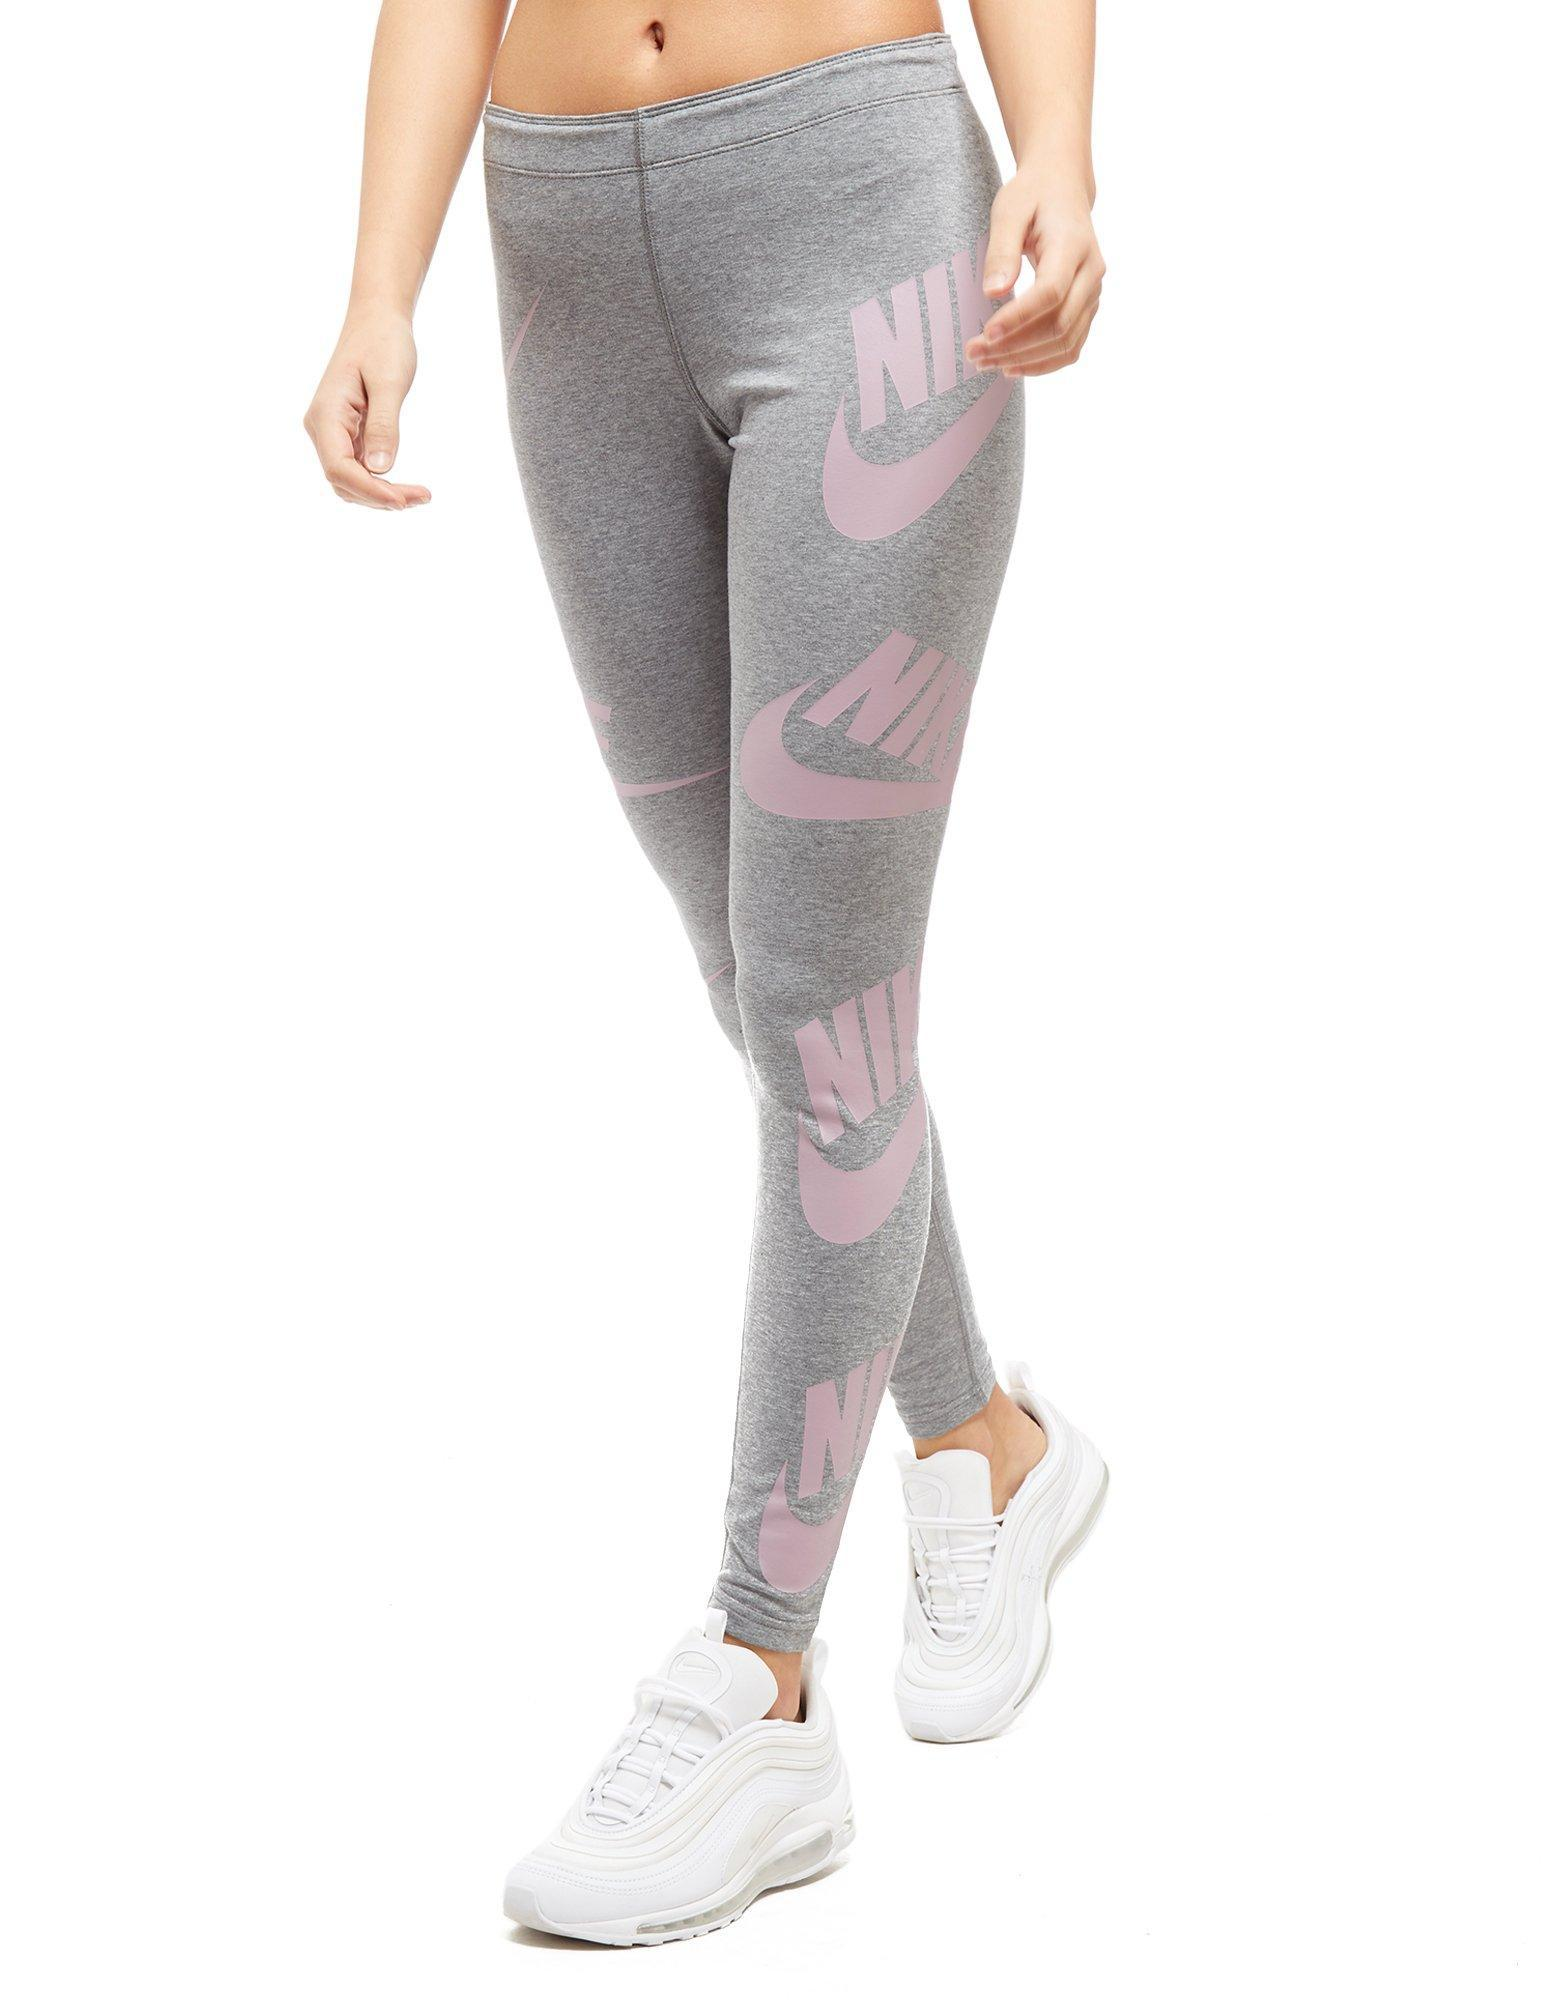 Leggings Futura All Gray Over In Lyst Print Nike nXxwffRv